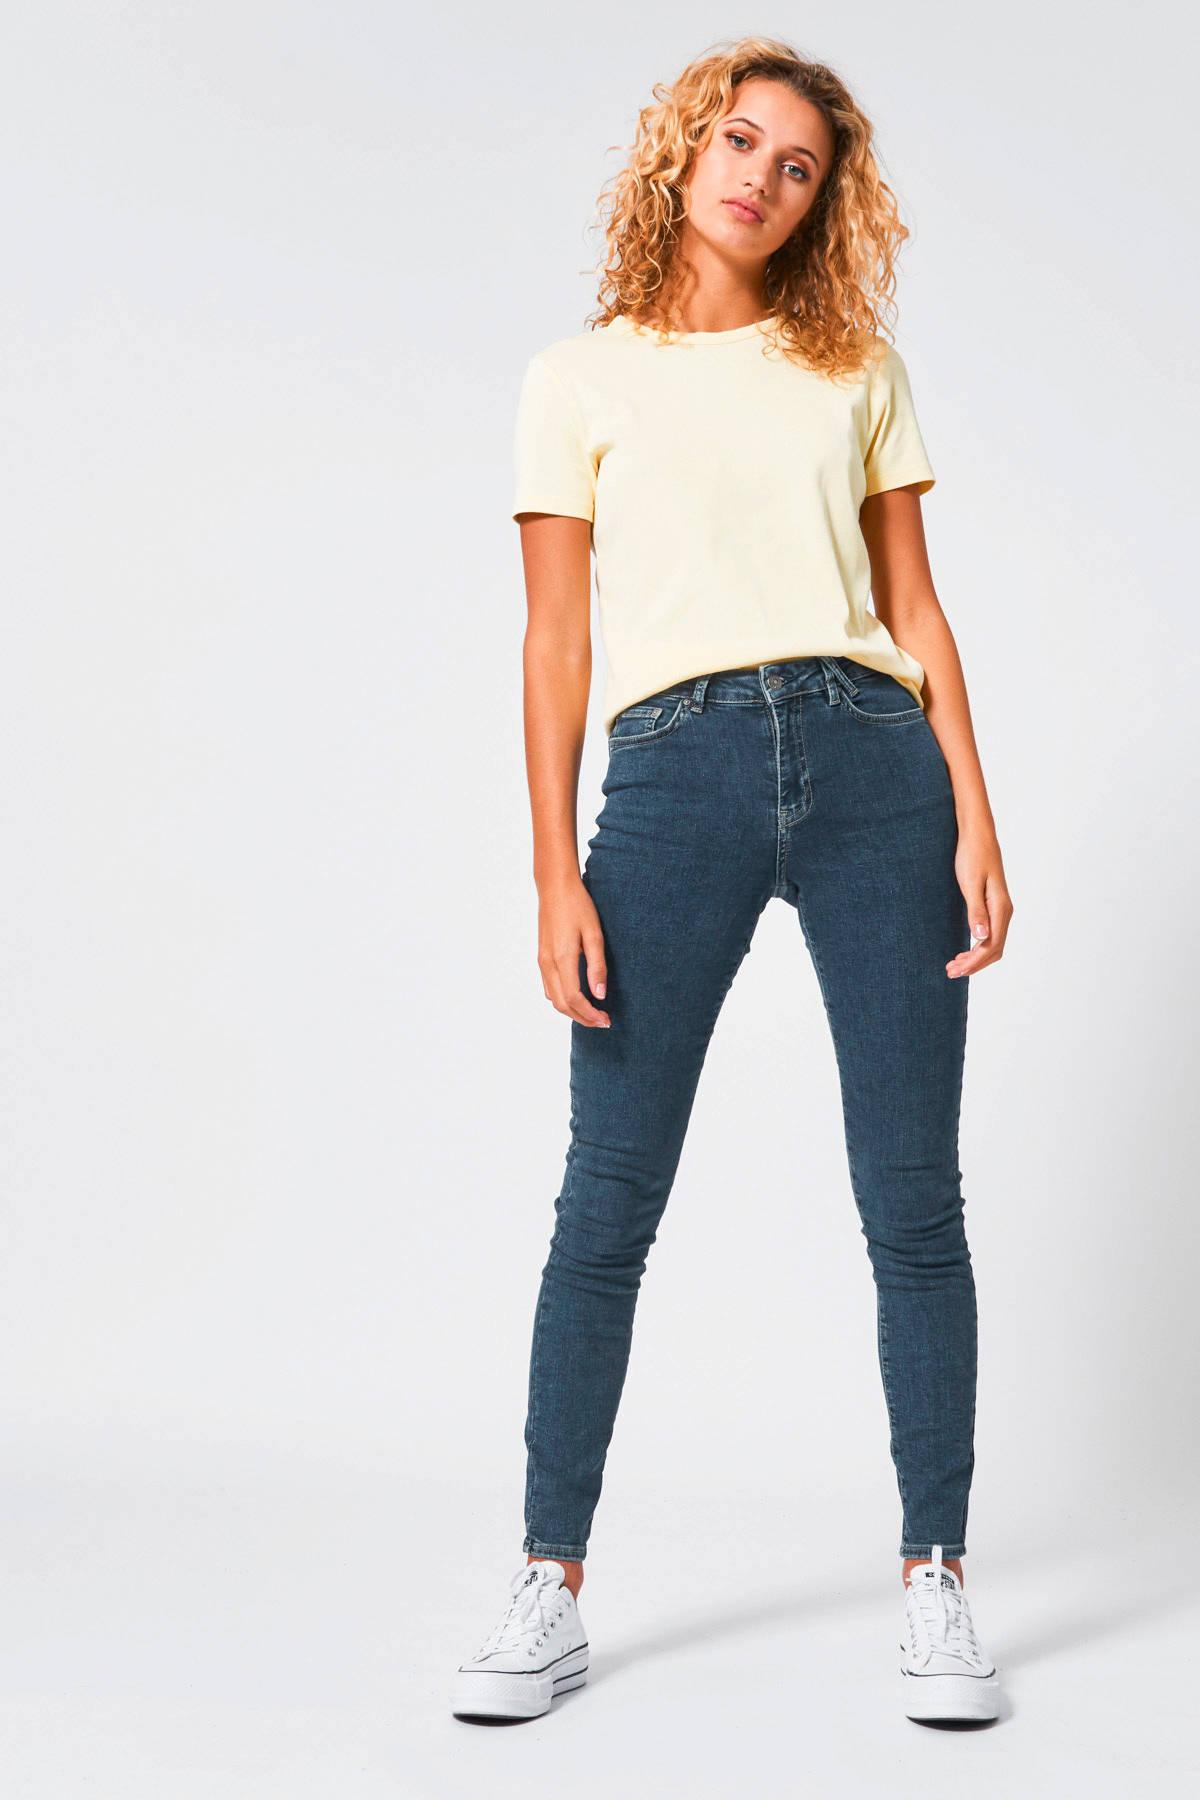 America Today dames skinny jeans bij wehkamp Gratis